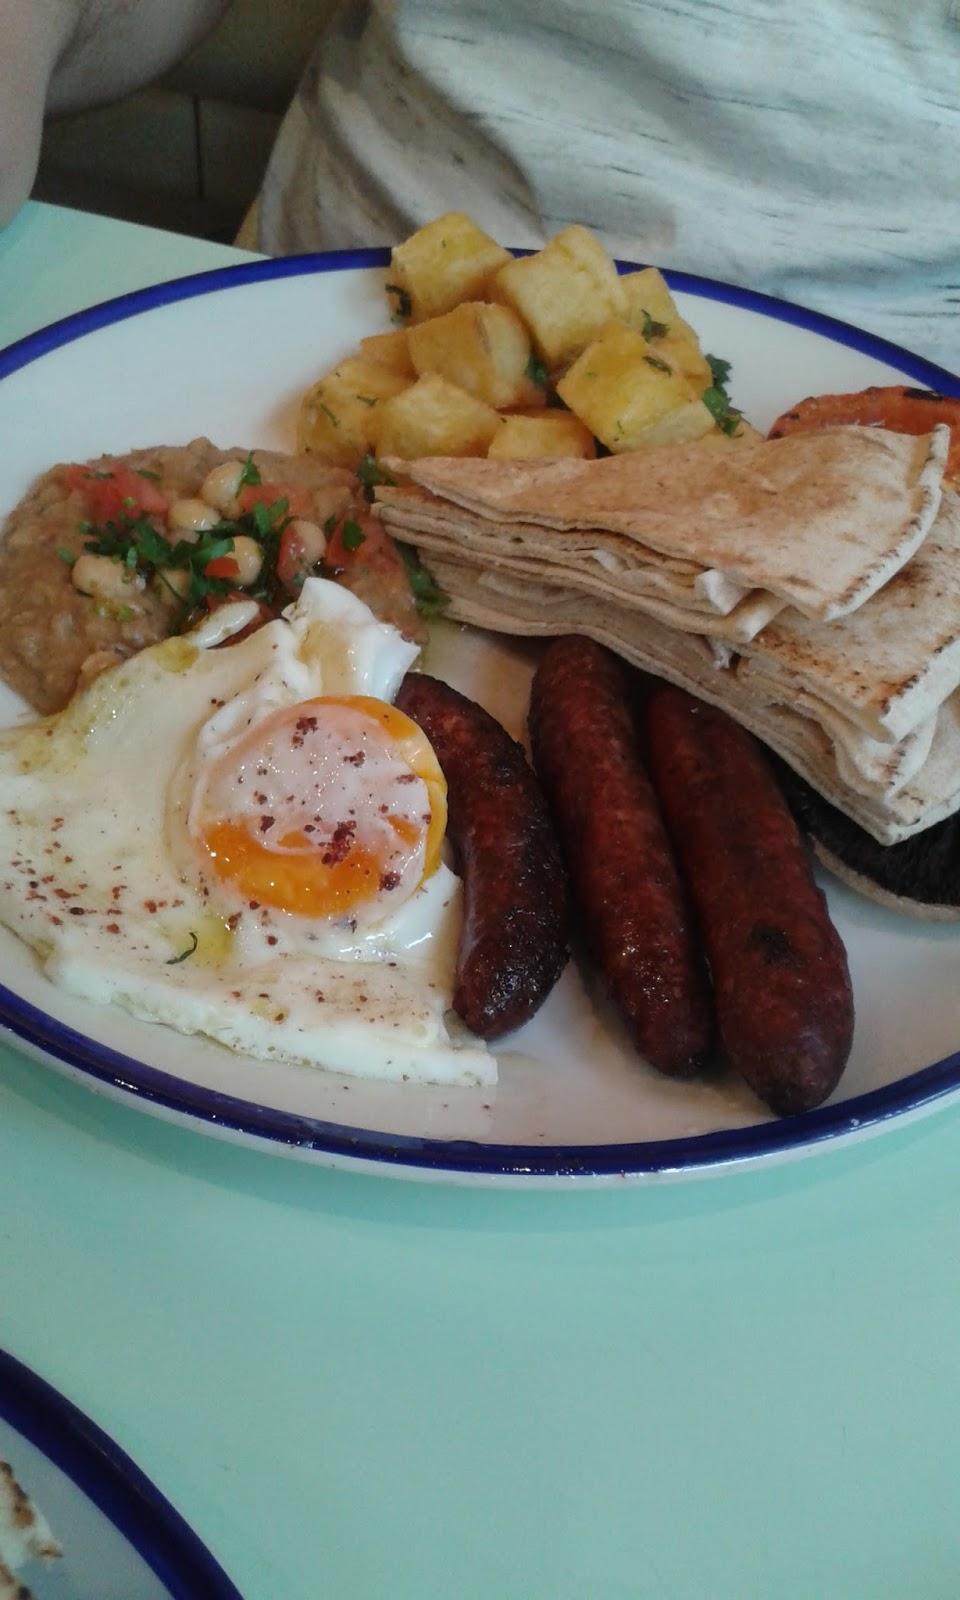 Blooming Fiction, lifestyle blog, Compoir Libanais - Home Of Amazing Lebanese Food